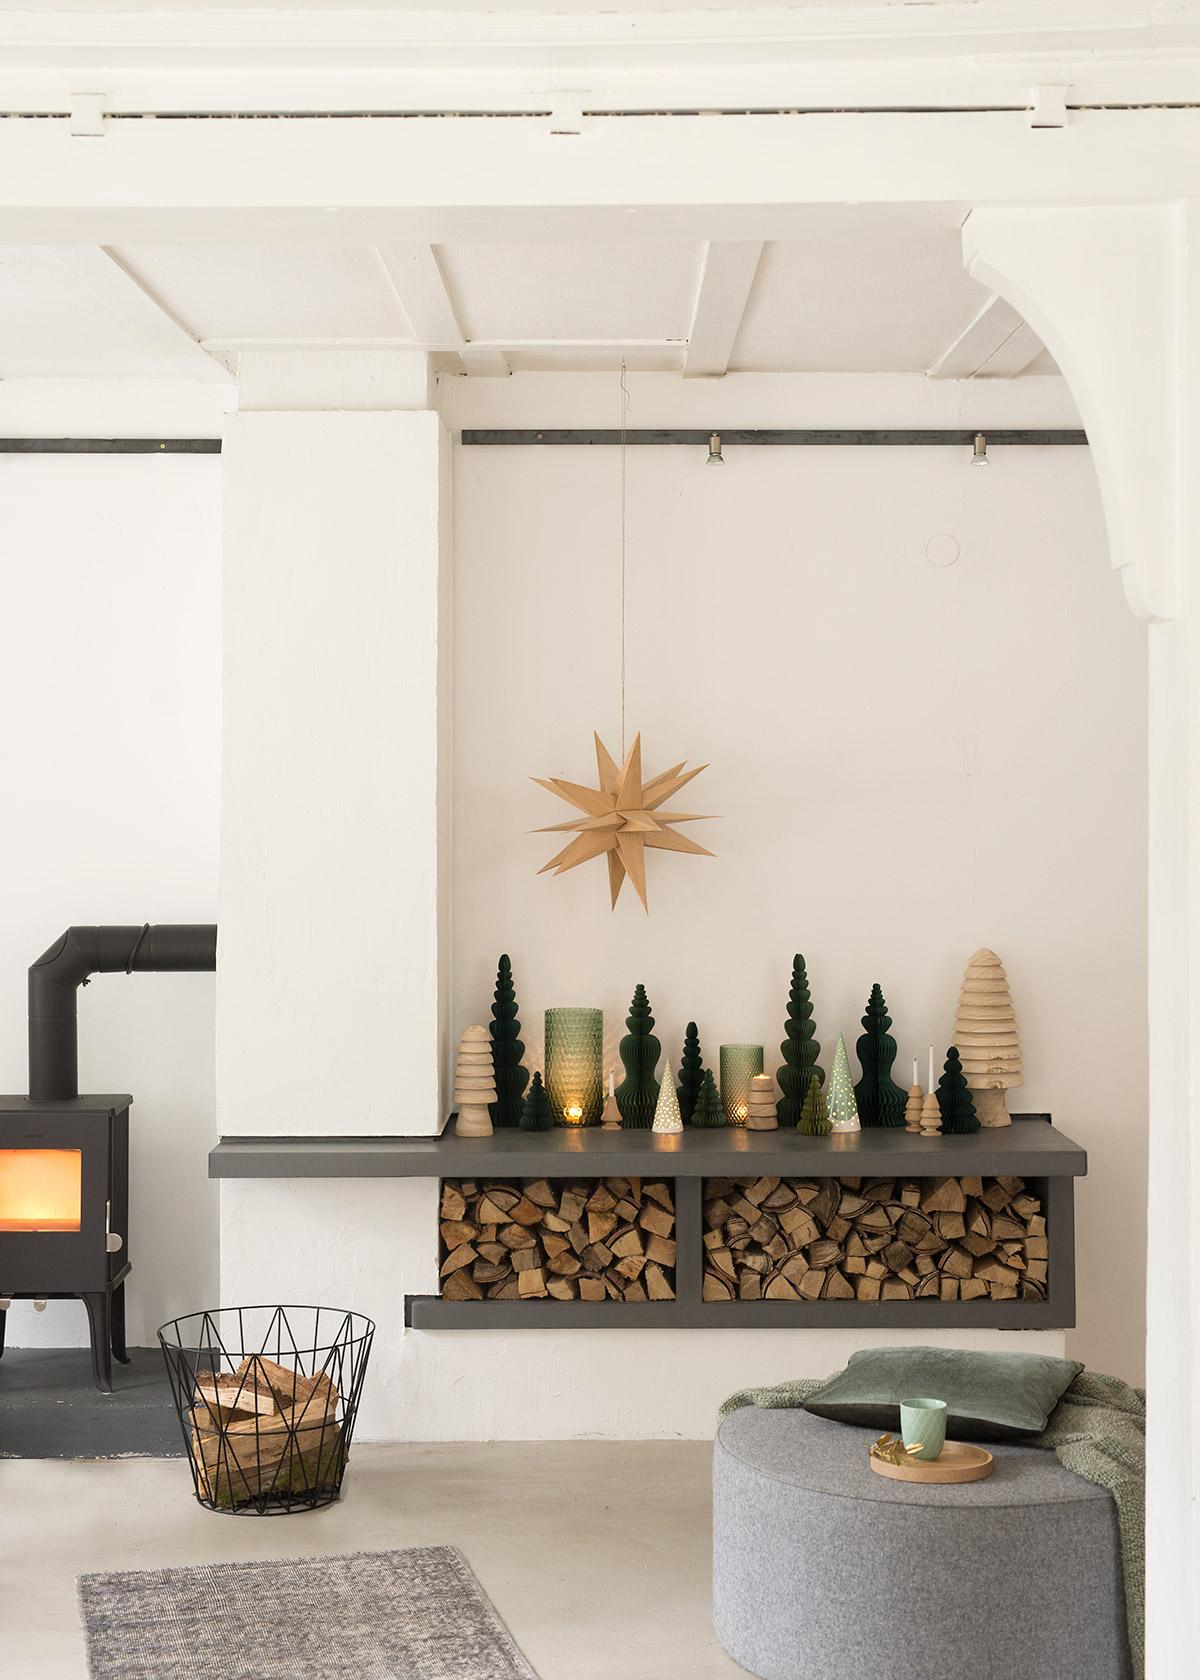 gruen-goldiger-weihnachtswald-wunderschoen-gemacht